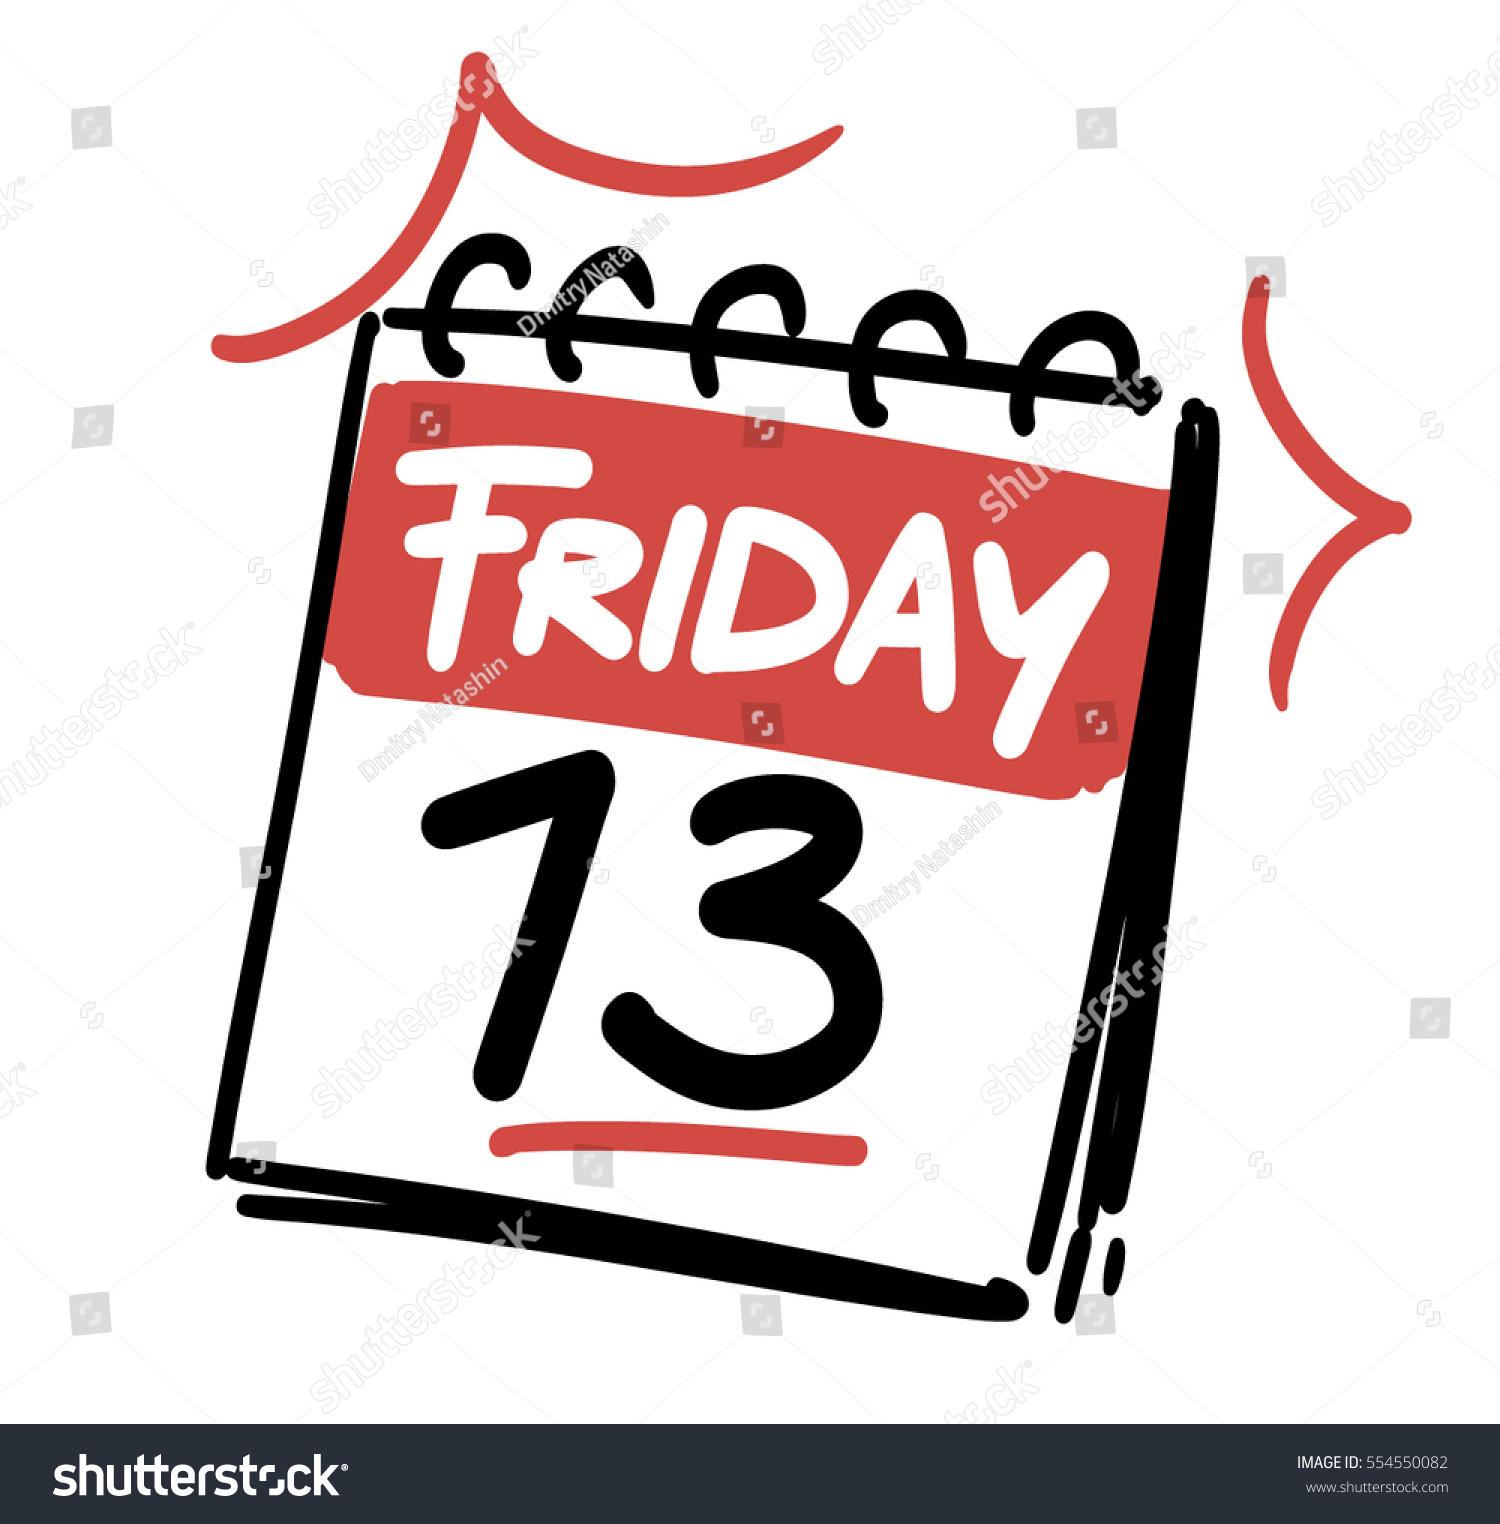 friday 13 th calendar date stock vector 554550082 shutterstock rh shutterstock com friday the 13th free clipart